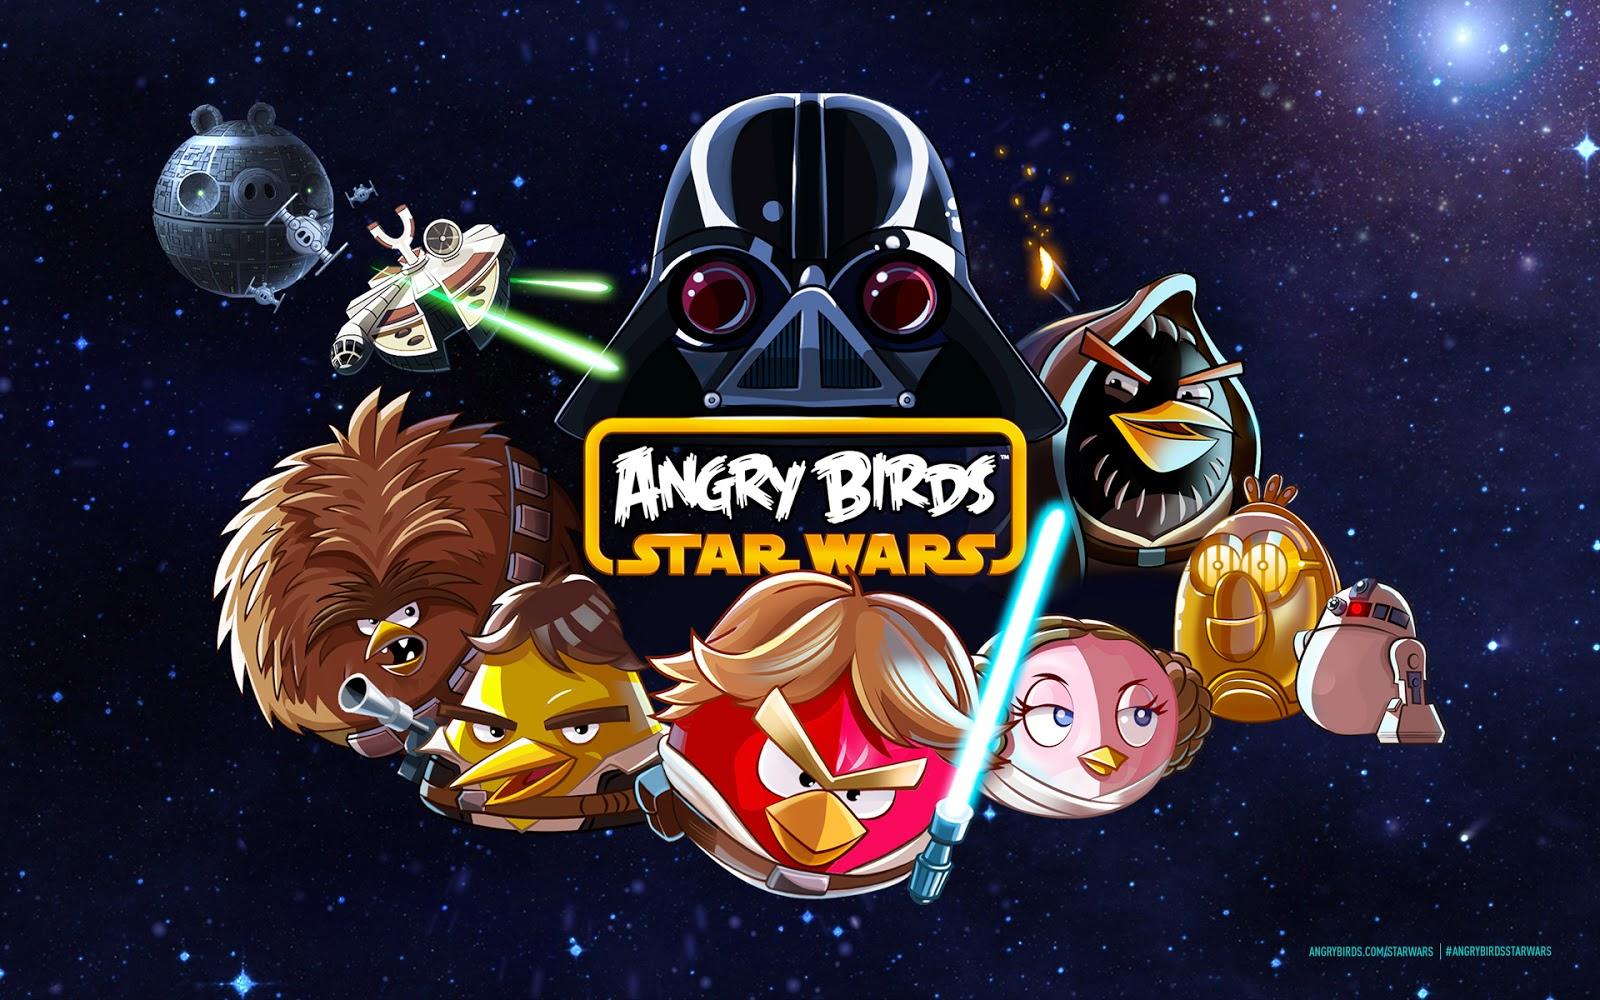 Angry Birds star wars مظغوطة,بوابة 2013 angry_birds_018.jpg